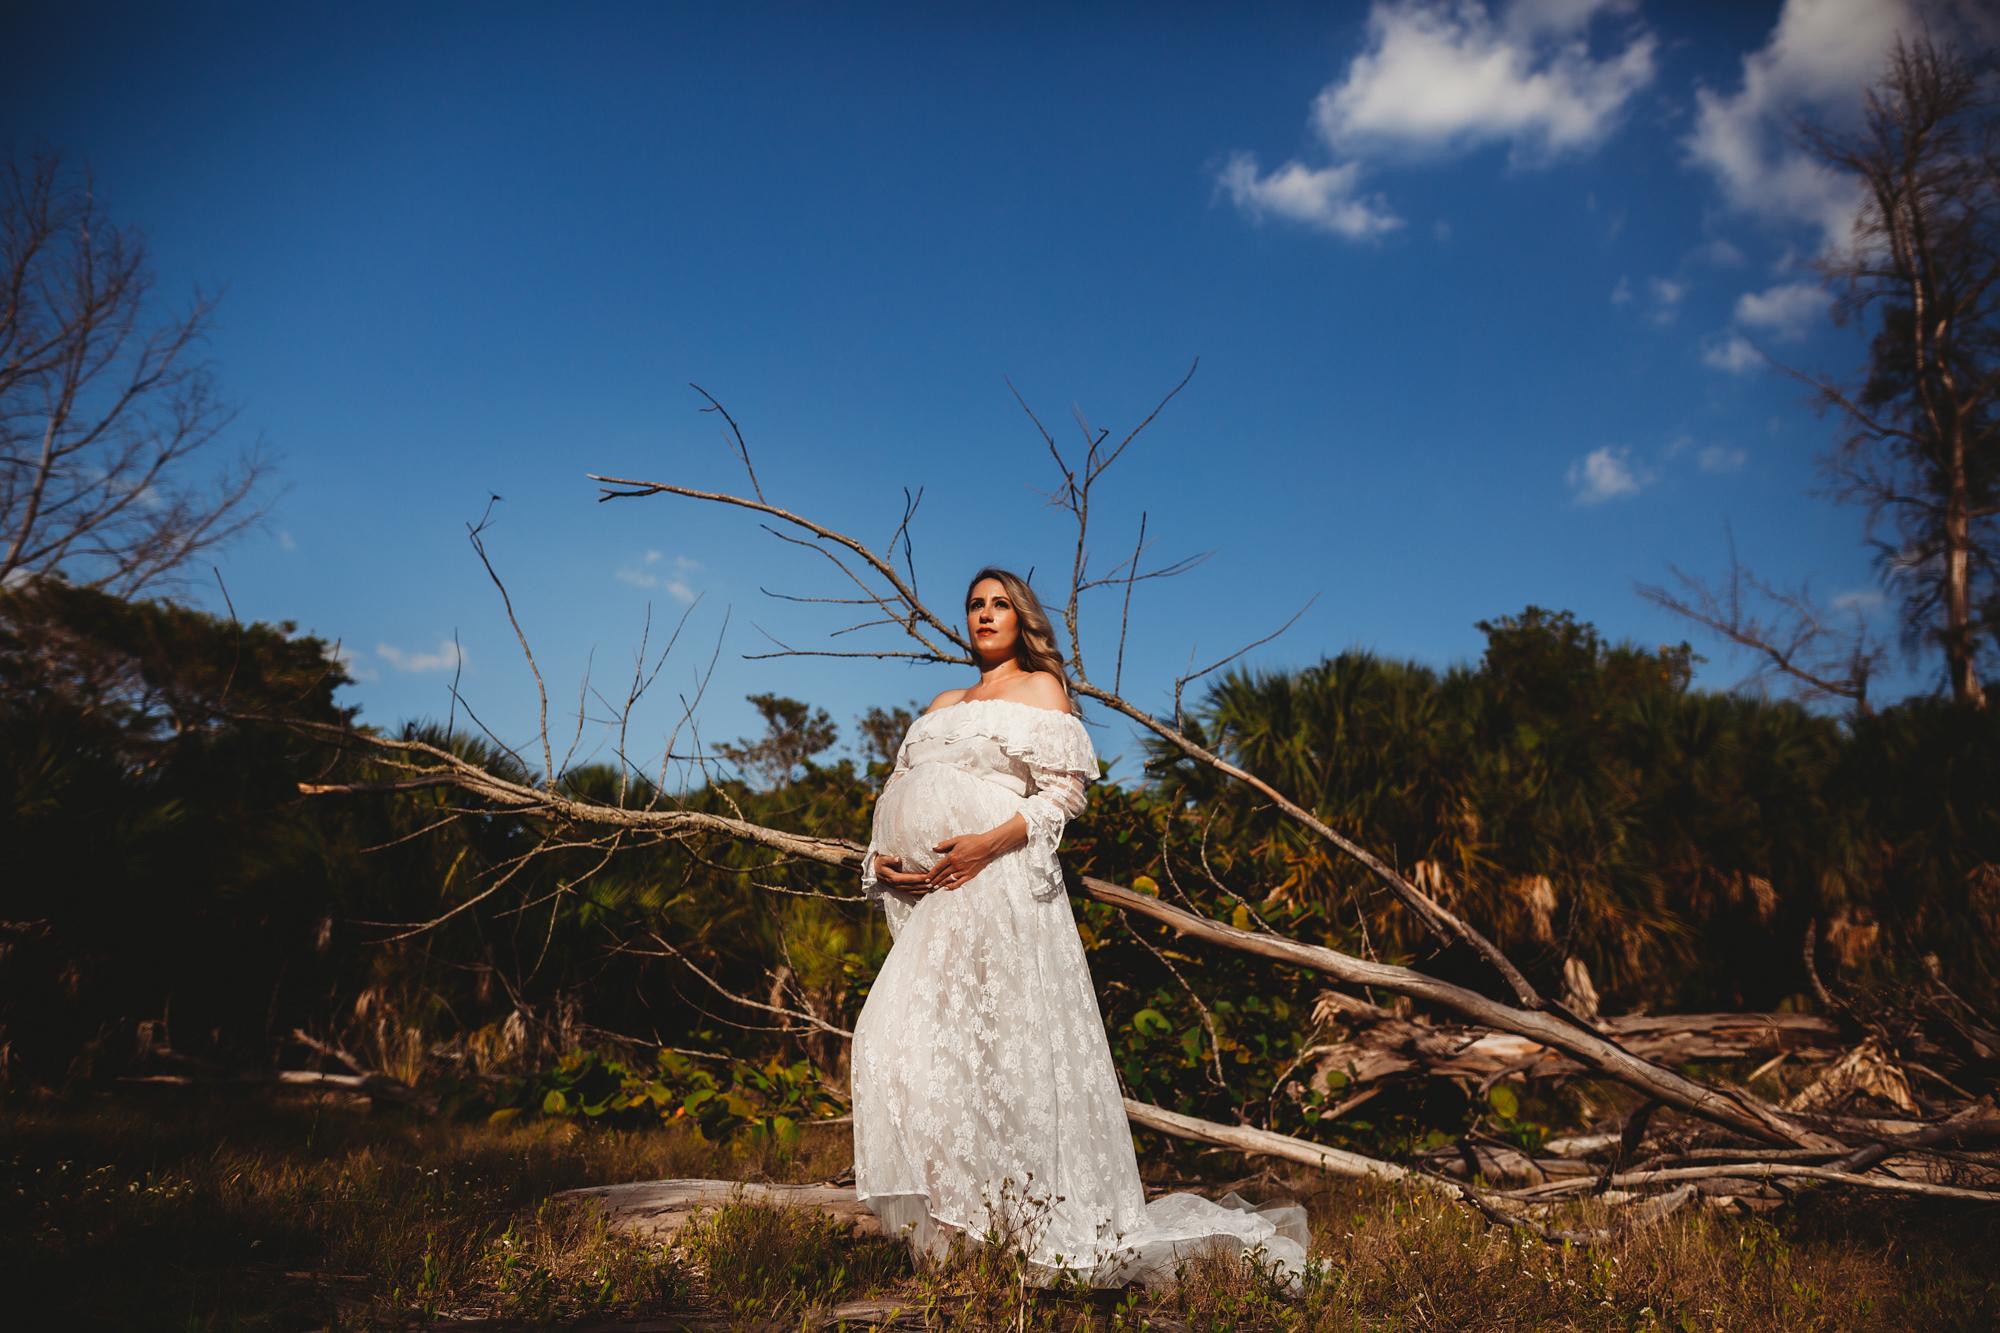 pinellas county fl maternity photo shoot outside